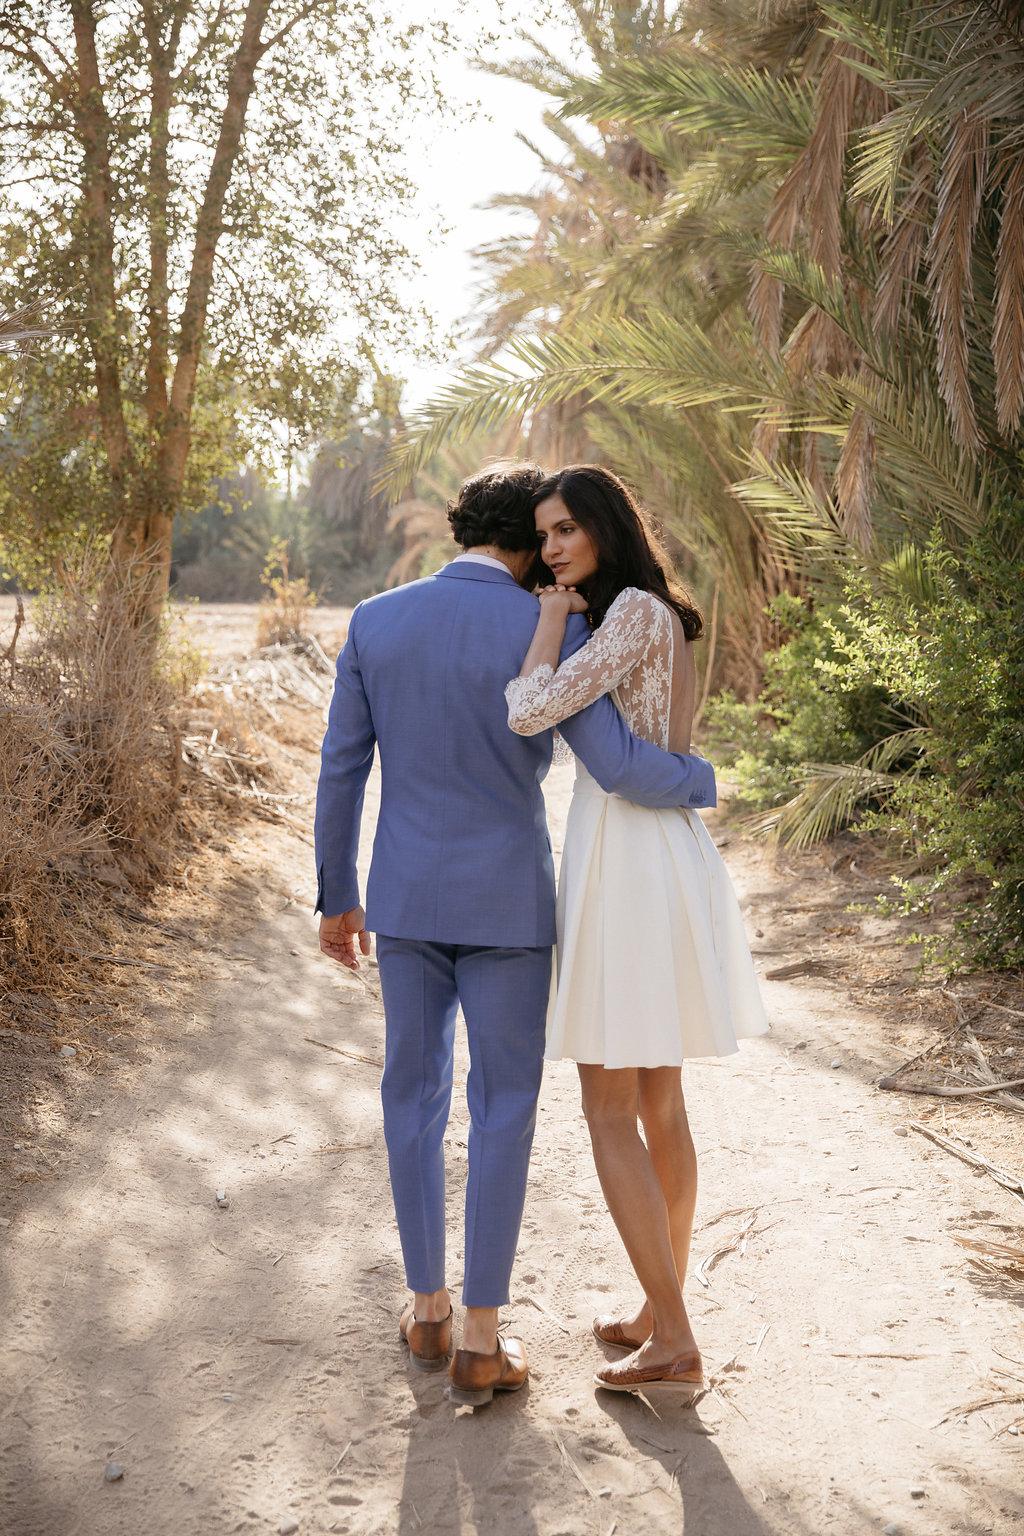 parisian-inspired-blog-mariage879-Yann-Audic-Faubourg-Saint-Sulpice-SS18_MG_9041.jpg